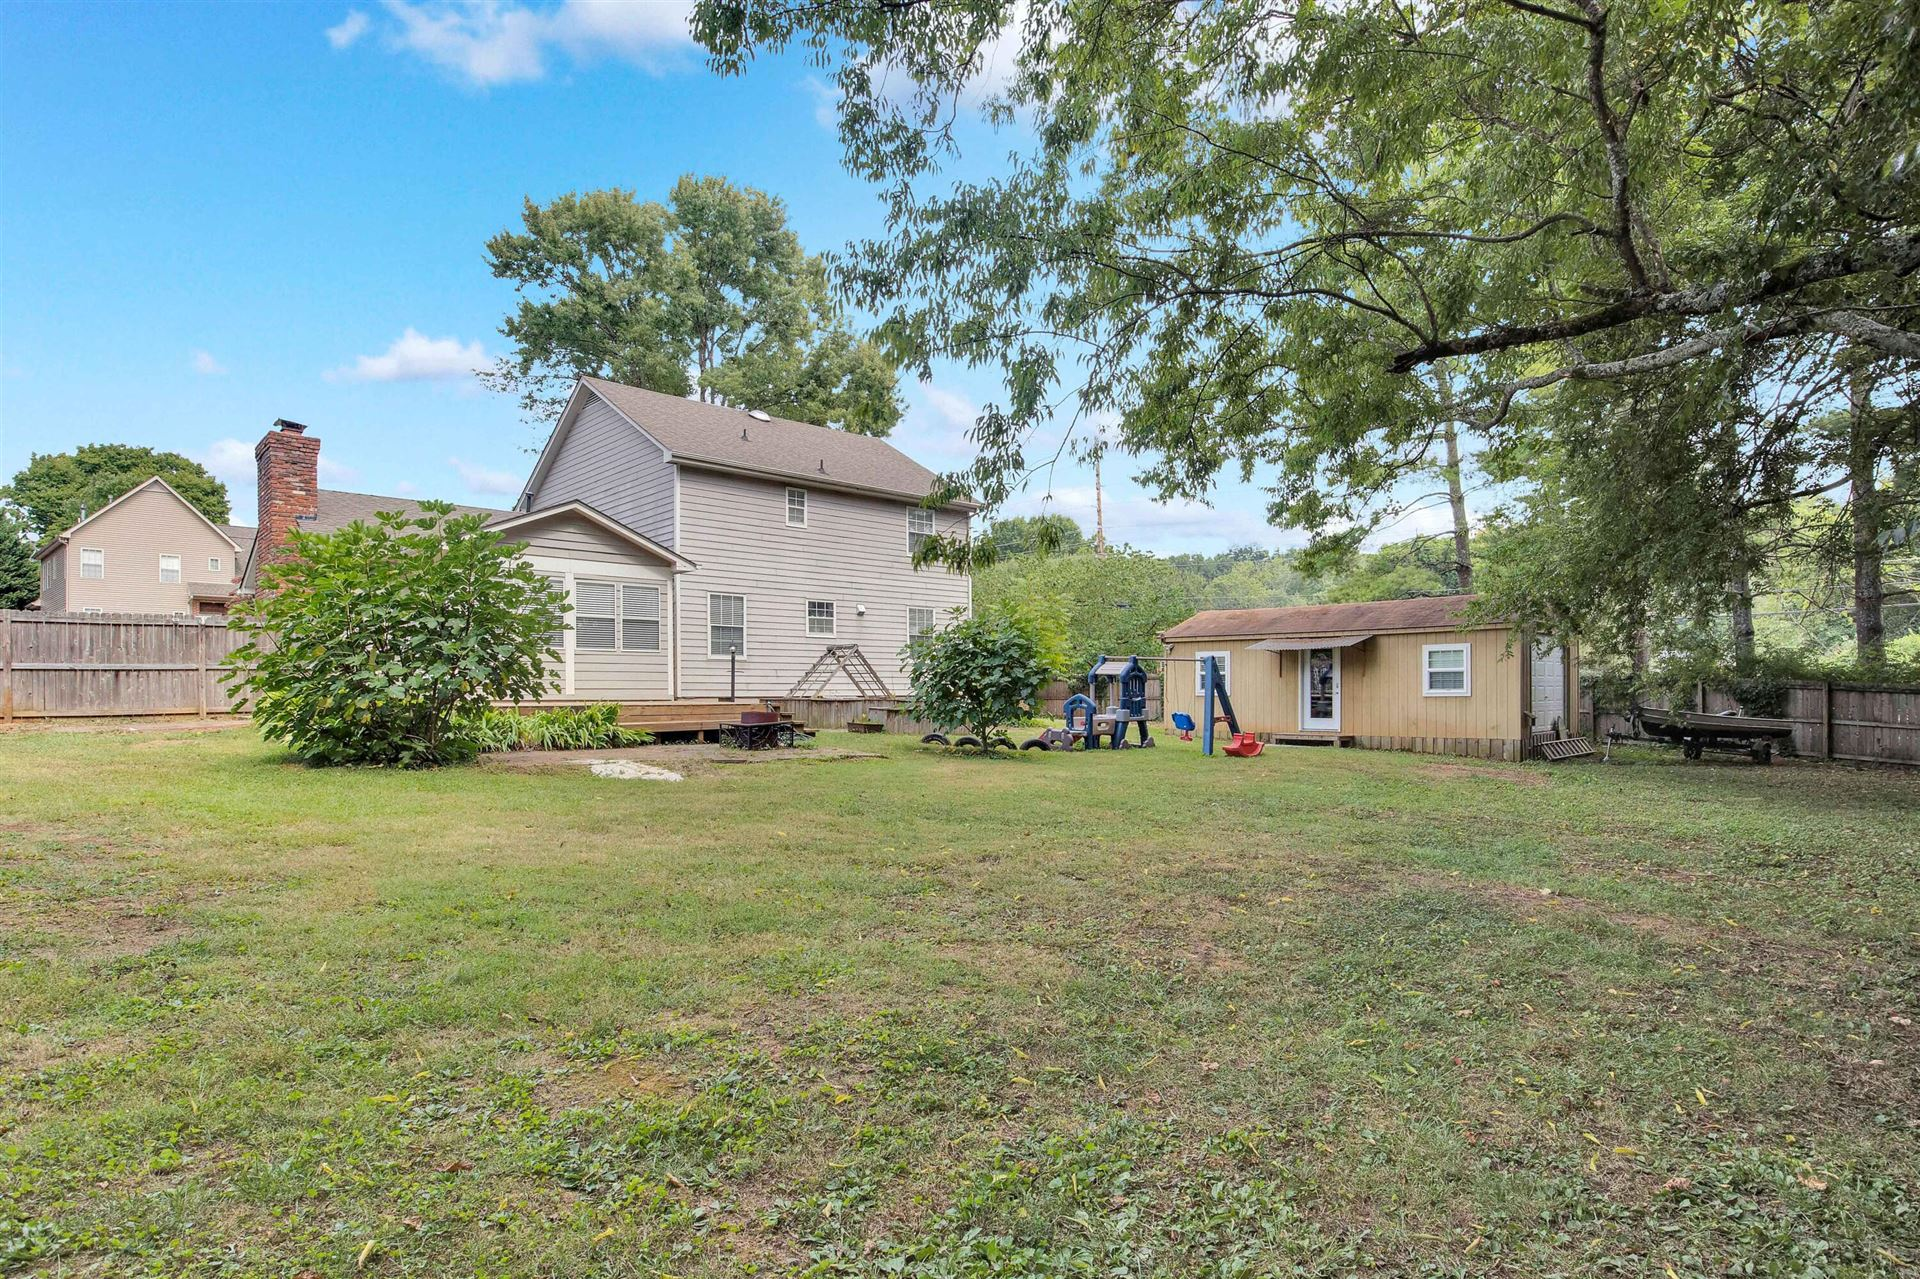 Photo of 1827 Nantasket Rd, Knoxville, TN 37922 (MLS # 1161455)